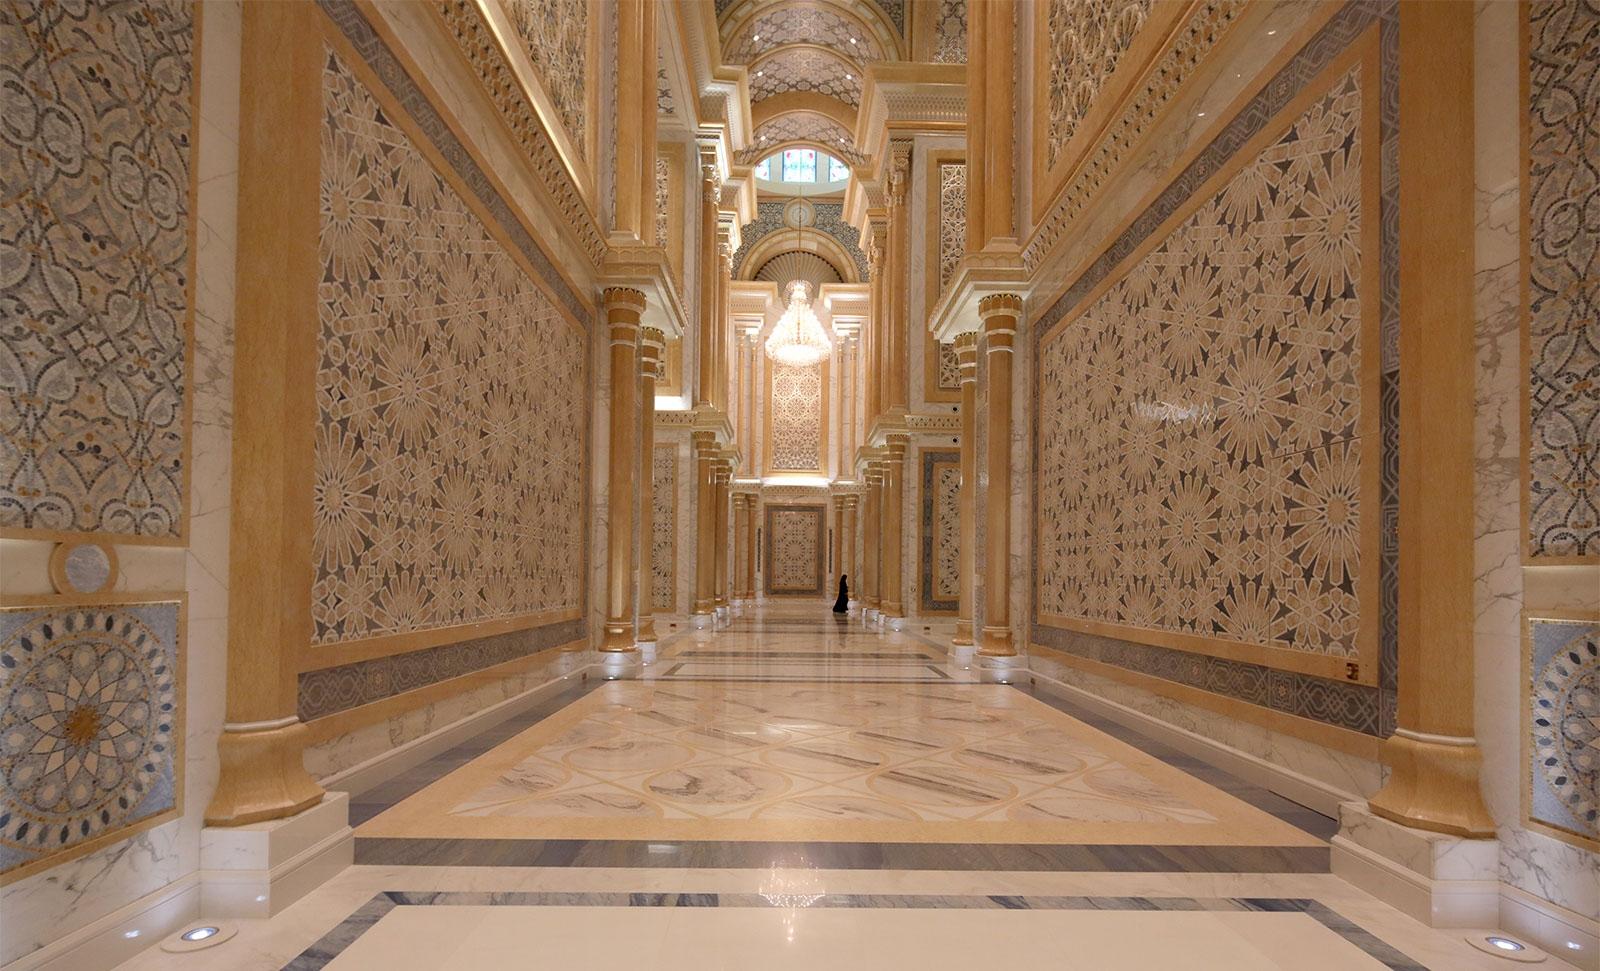 Qasr Al Watan Palace - Abu Dhabi